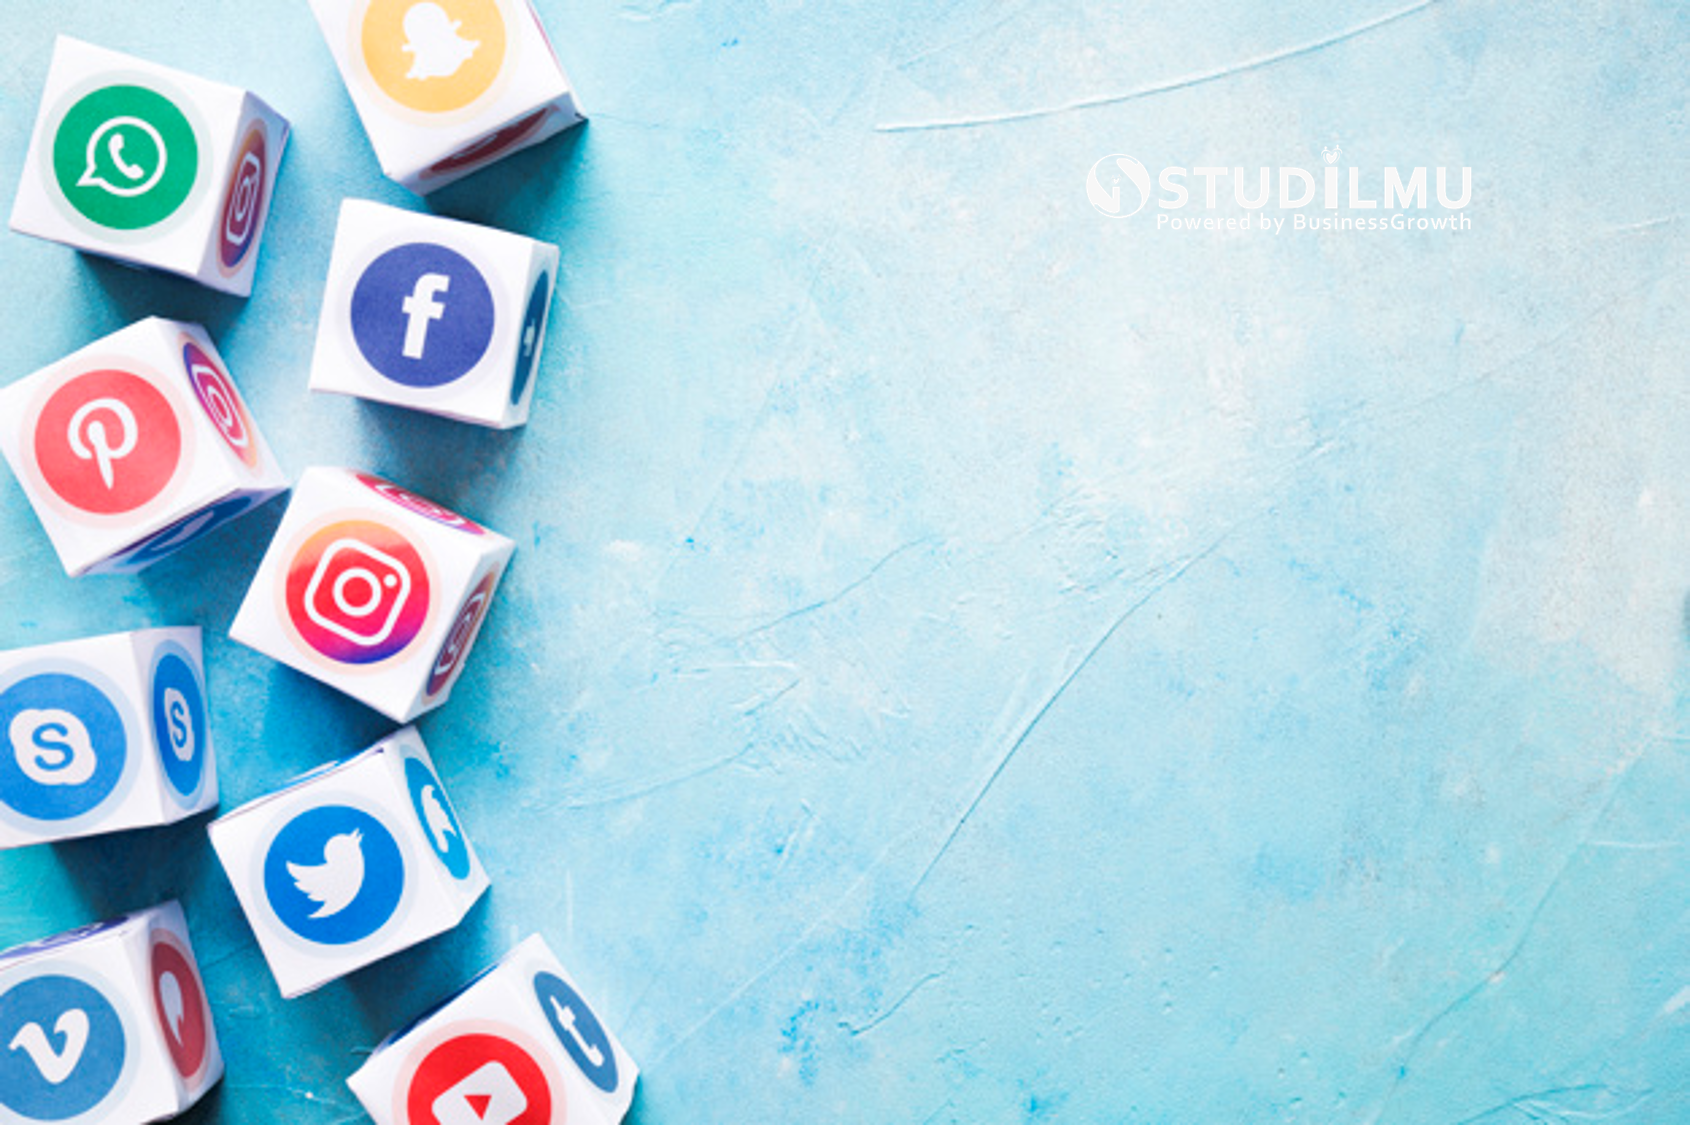 STUDILMU Career Advice - 5 Aturan Media Sosial yang Harus Diketahui Setiap Pengusaha